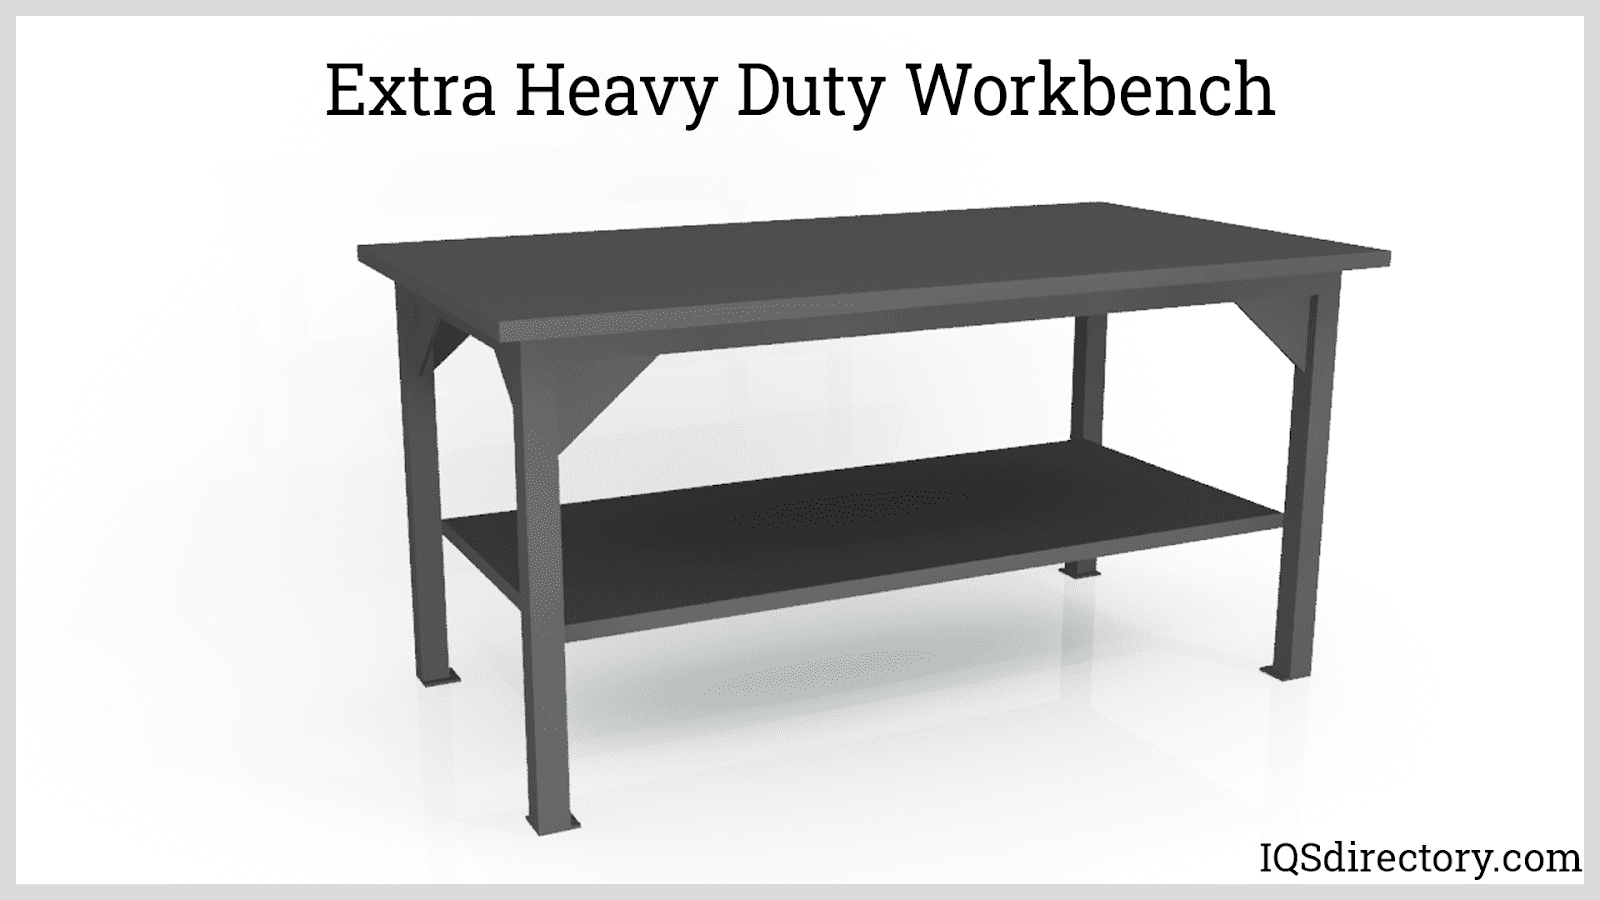 Extra Heavy Duty Workbench